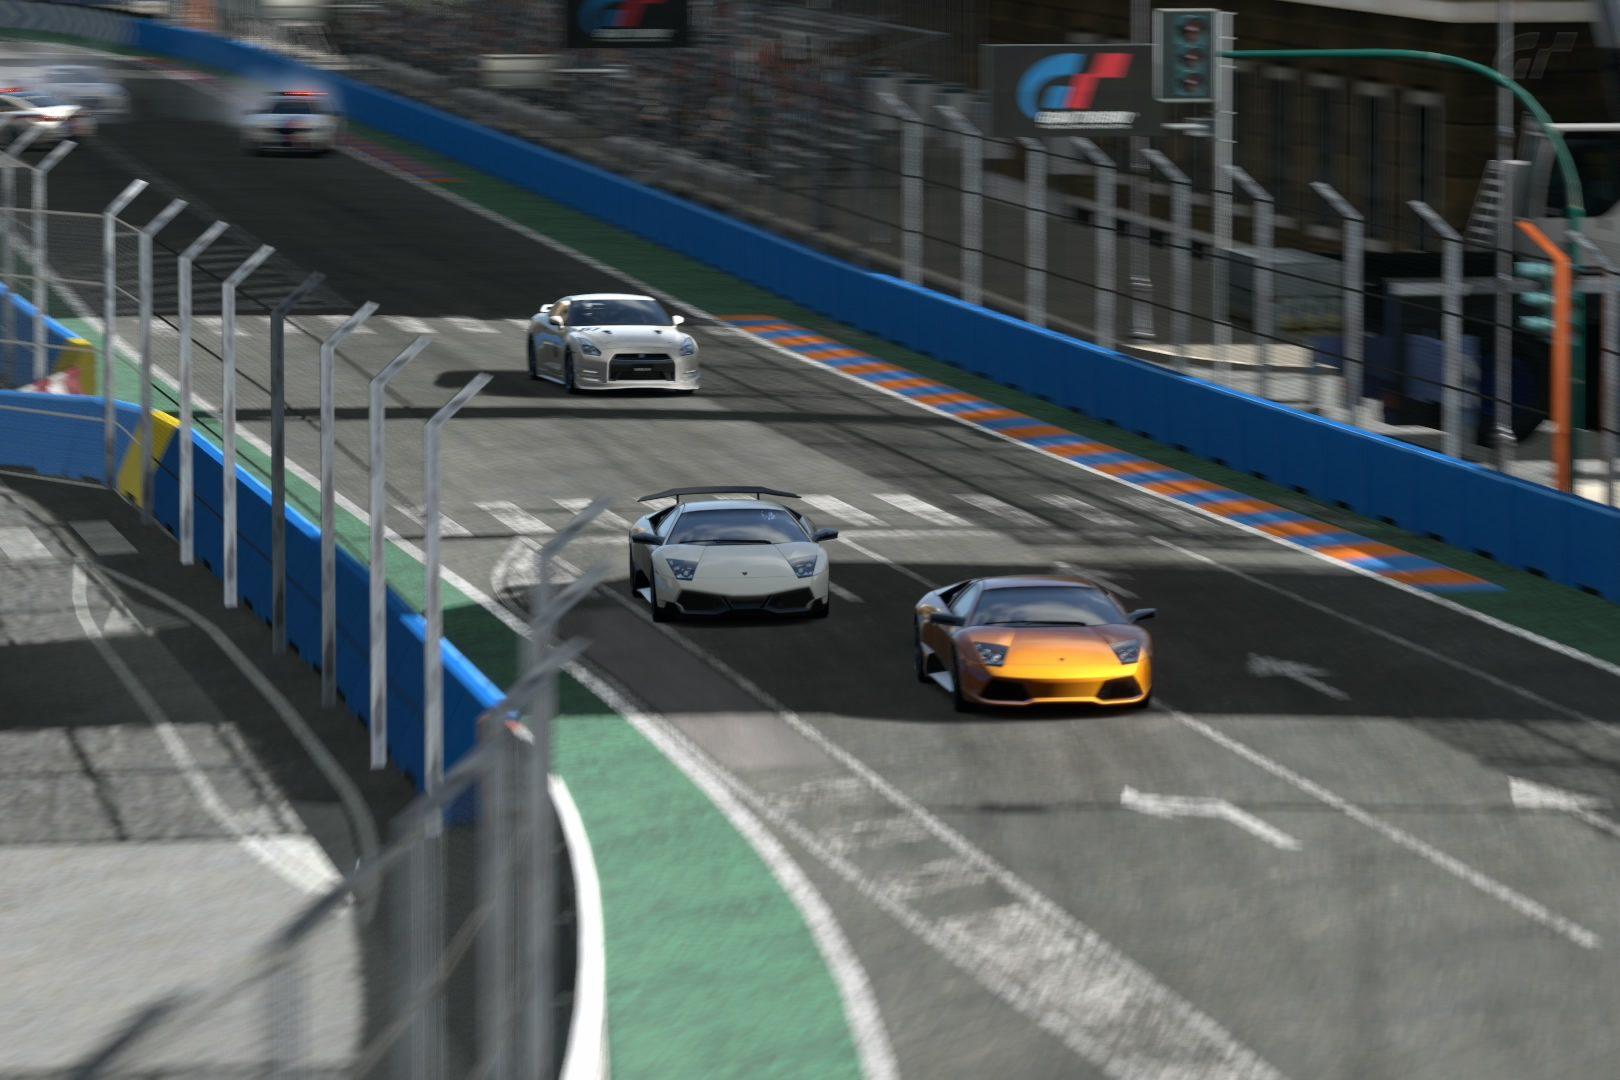 Circuito di Roma_3.jpg